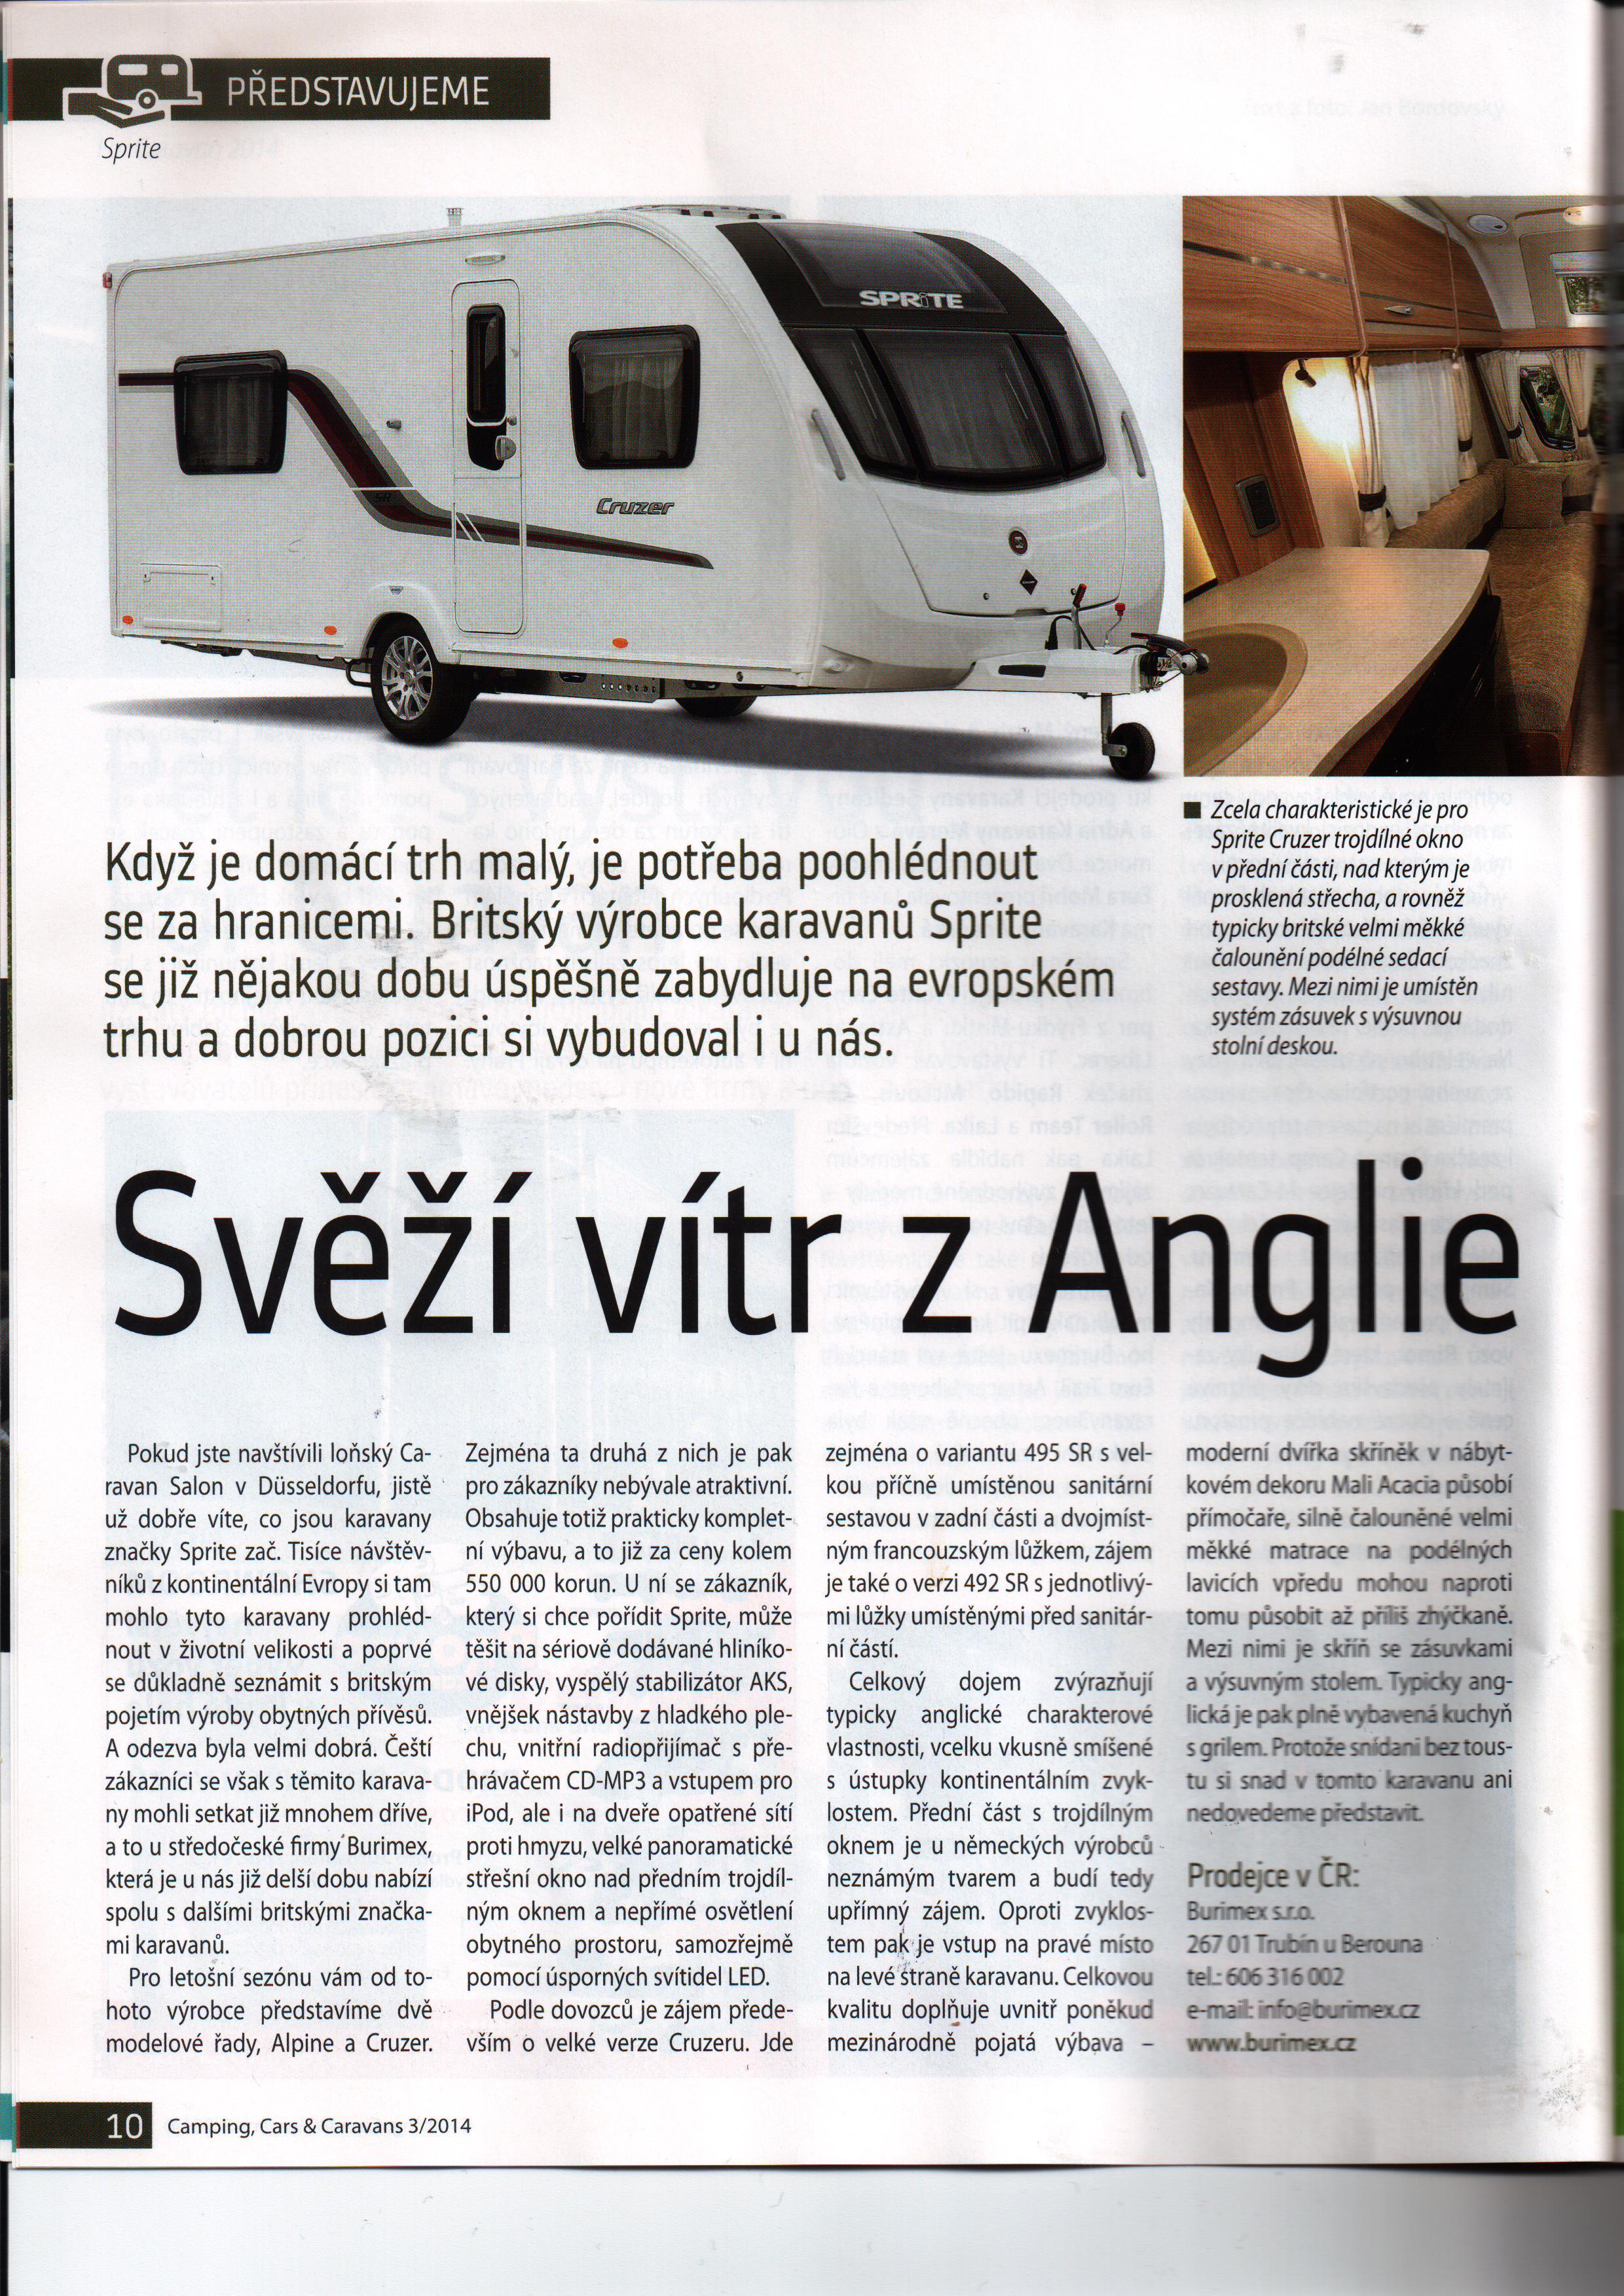 Článek o našich karavanech v časopisu Camping,Cars and Caravans